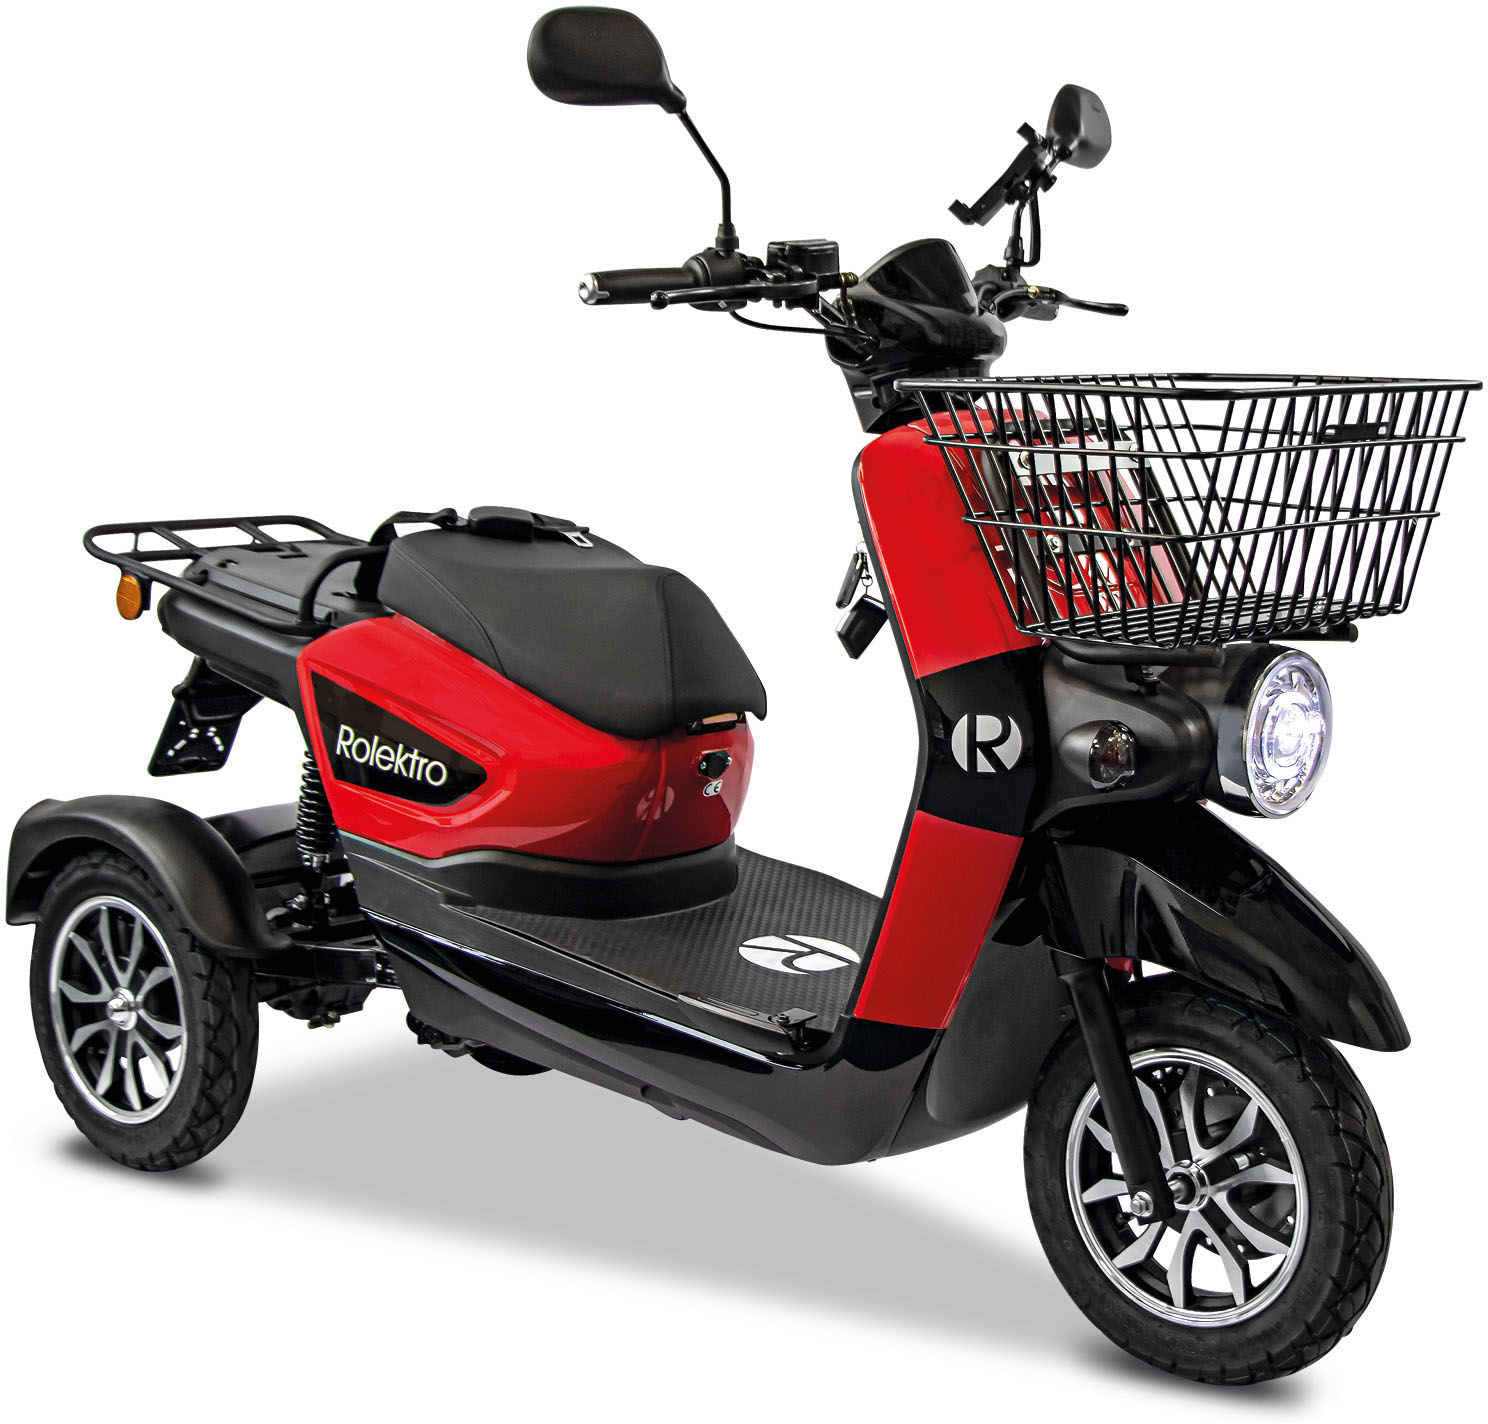 rolektro elektromobil rolektro e carrier 25 v 3 lithium ohne koffer 1000 w 25 km h korb - HASE Pino Steps E6000